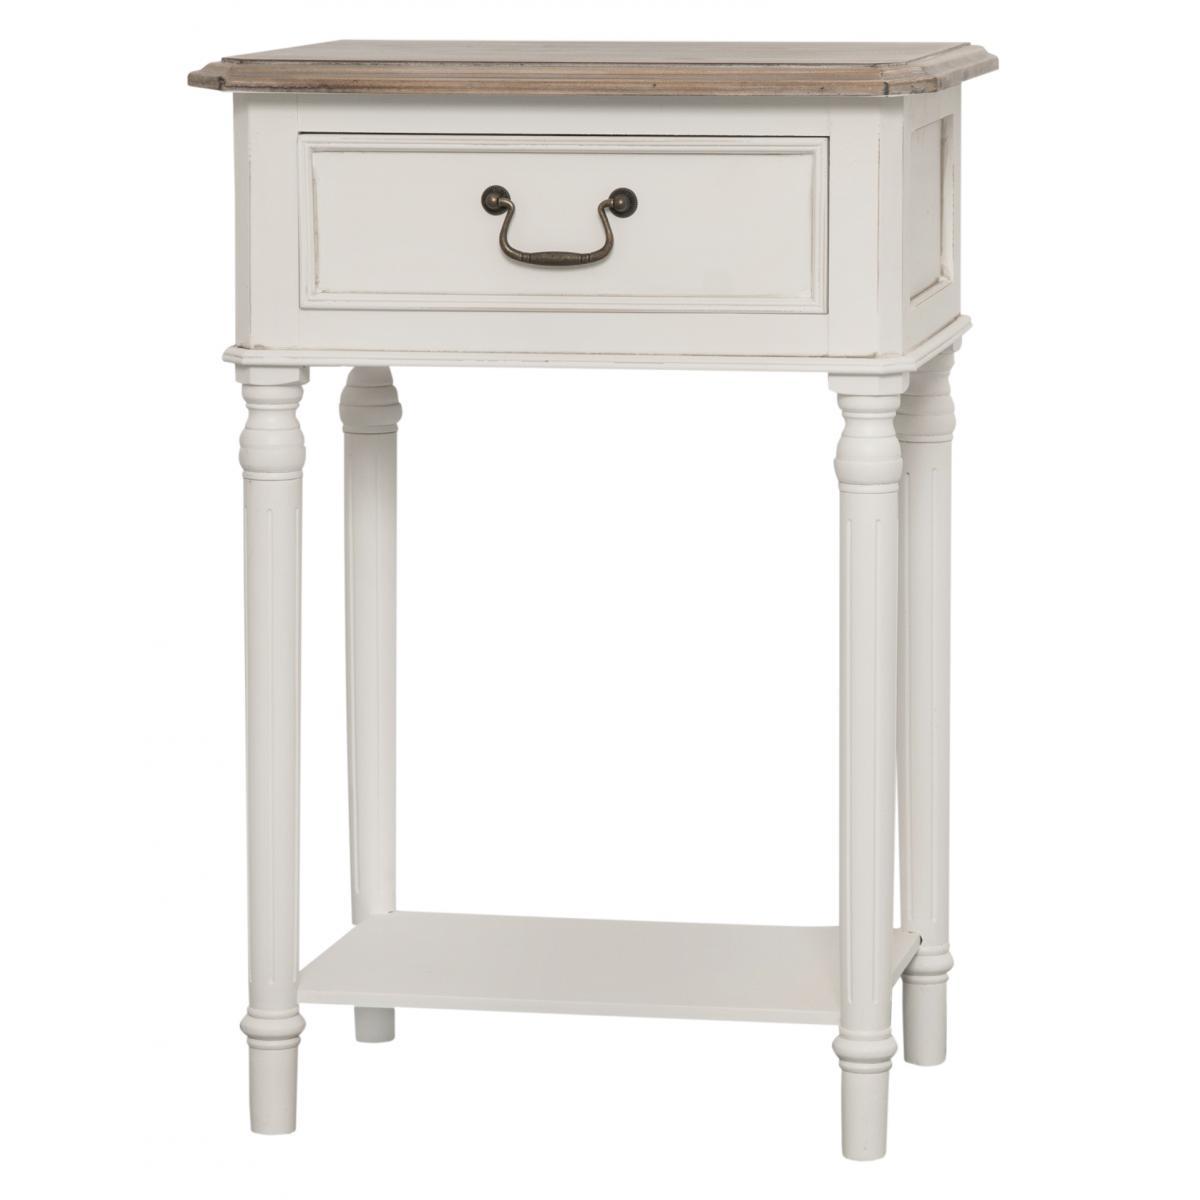 Cabinet din lemn de plop si MDF cu 1 sertar Ravenna RA019 White / Brown l47xA35xH69 cm